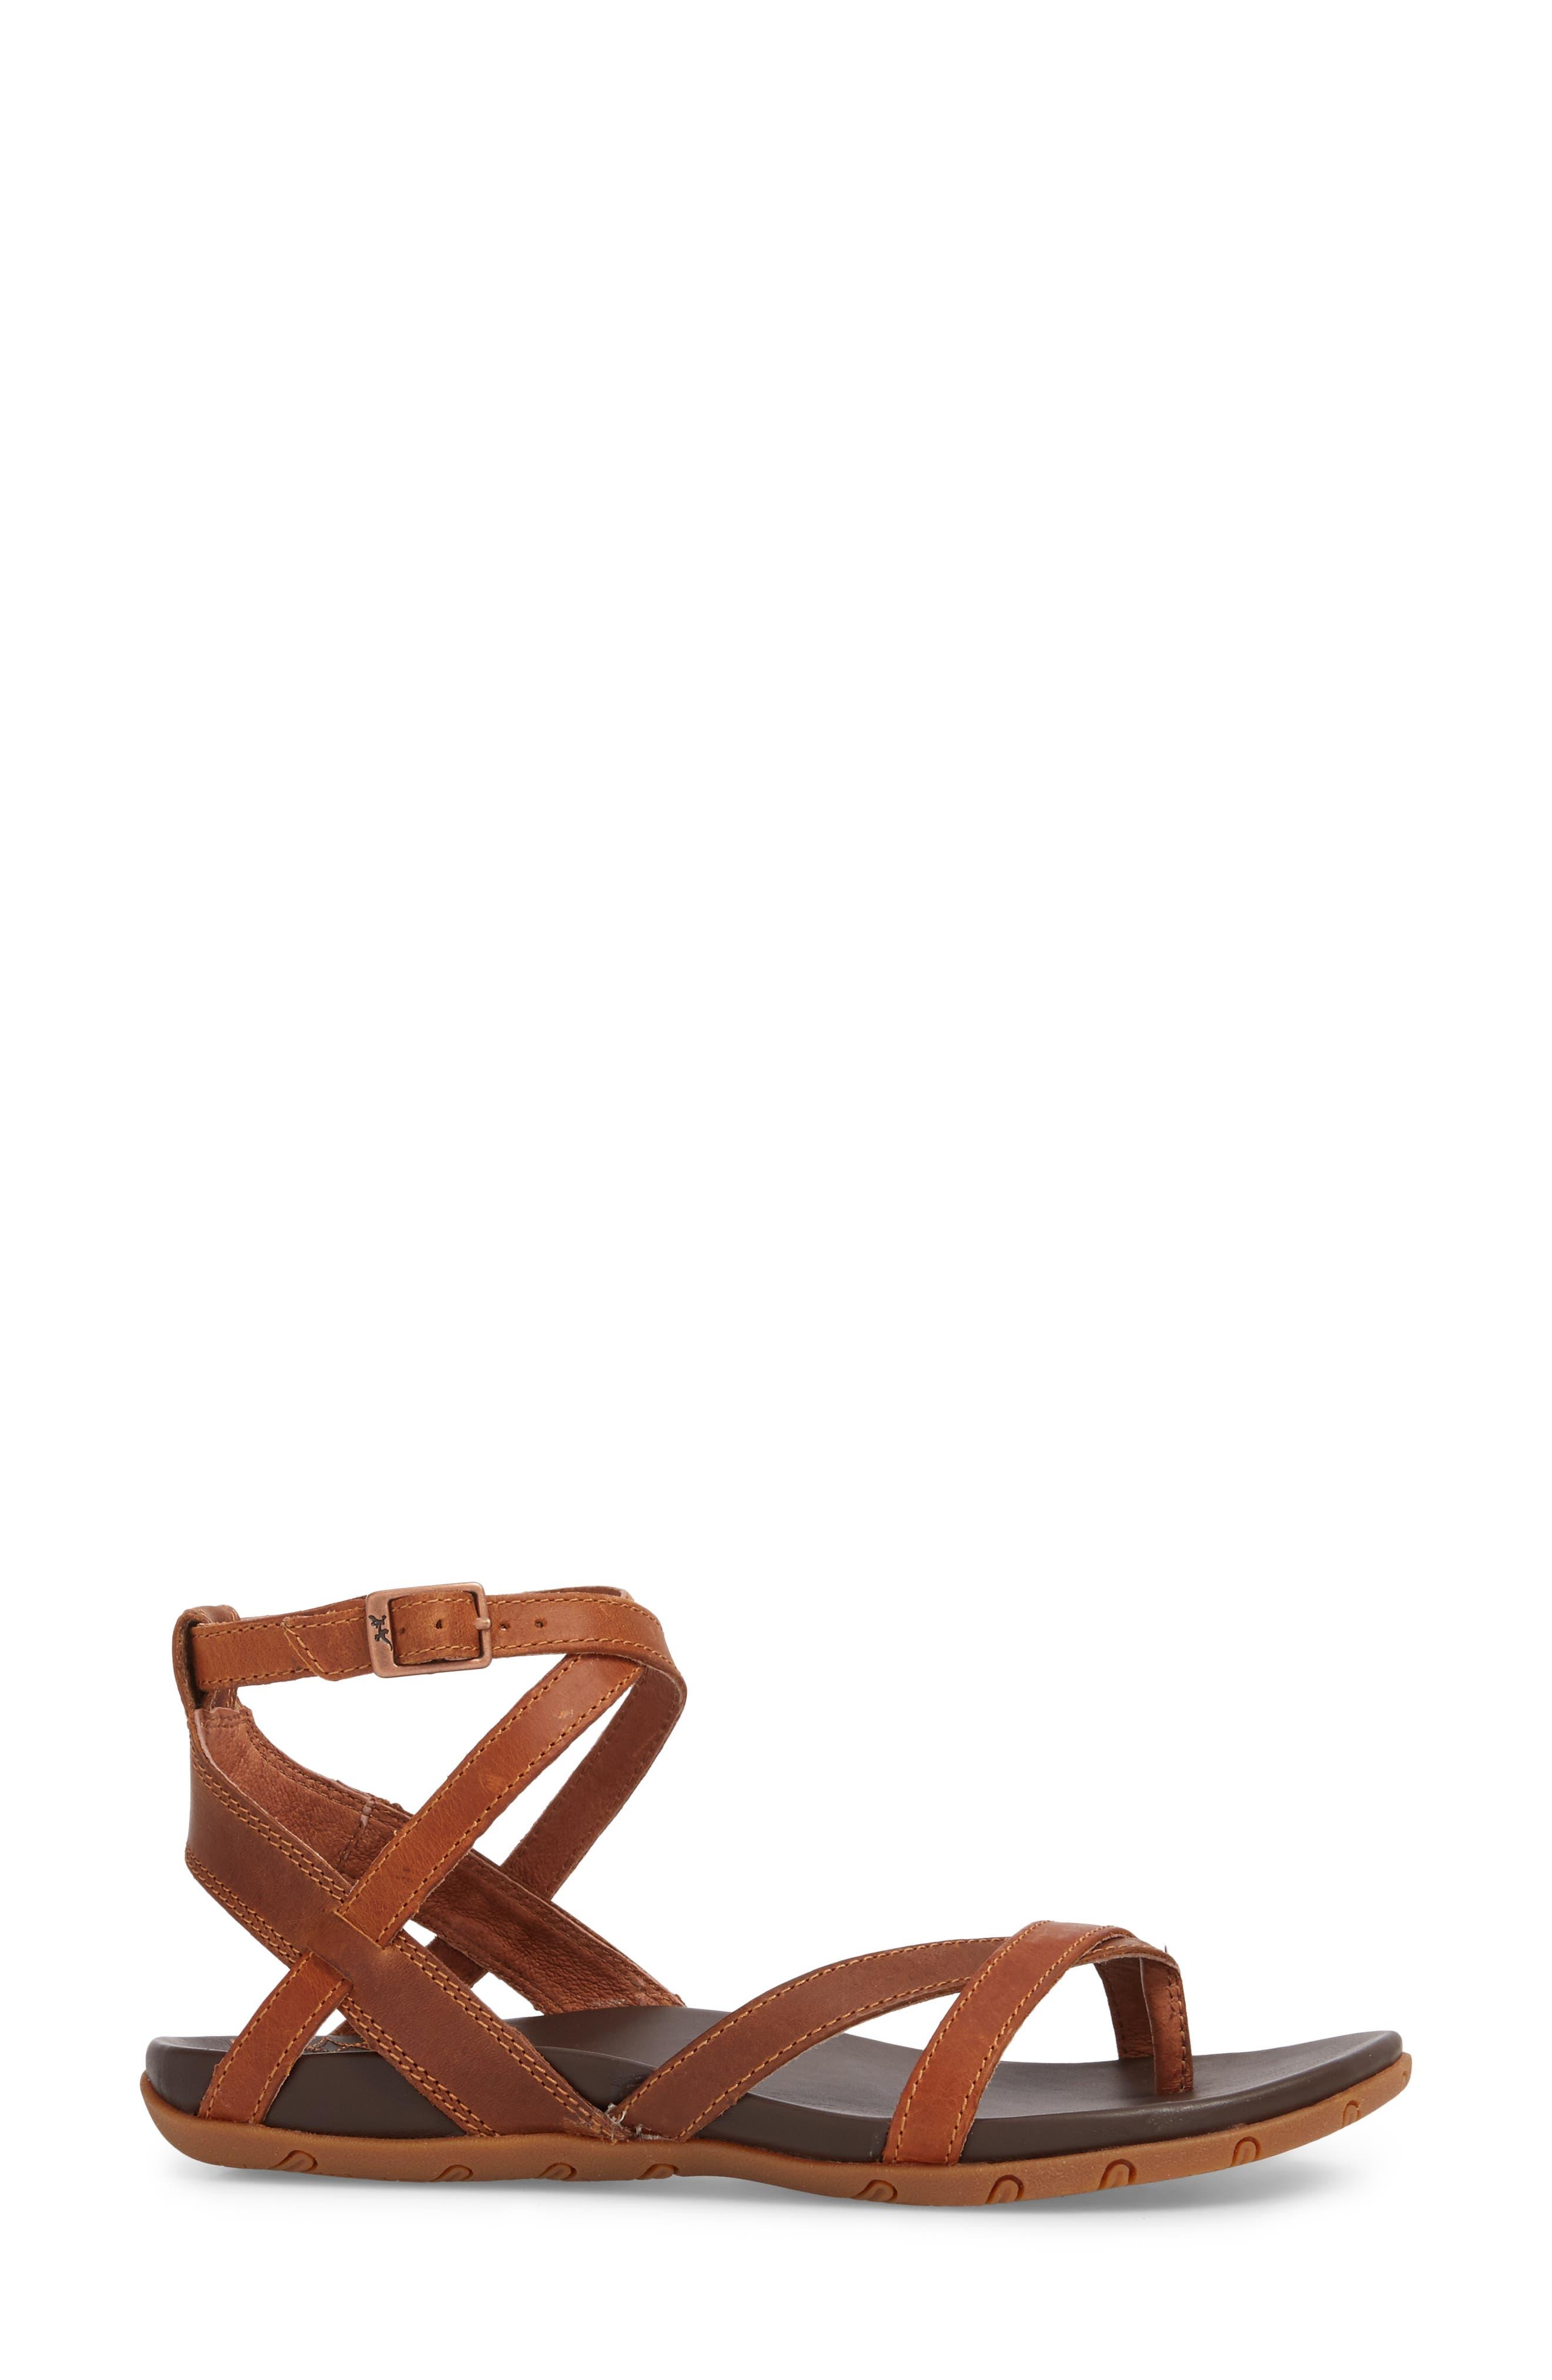 Juniper Sandal,                             Alternate thumbnail 3, color,                             Rust Leather